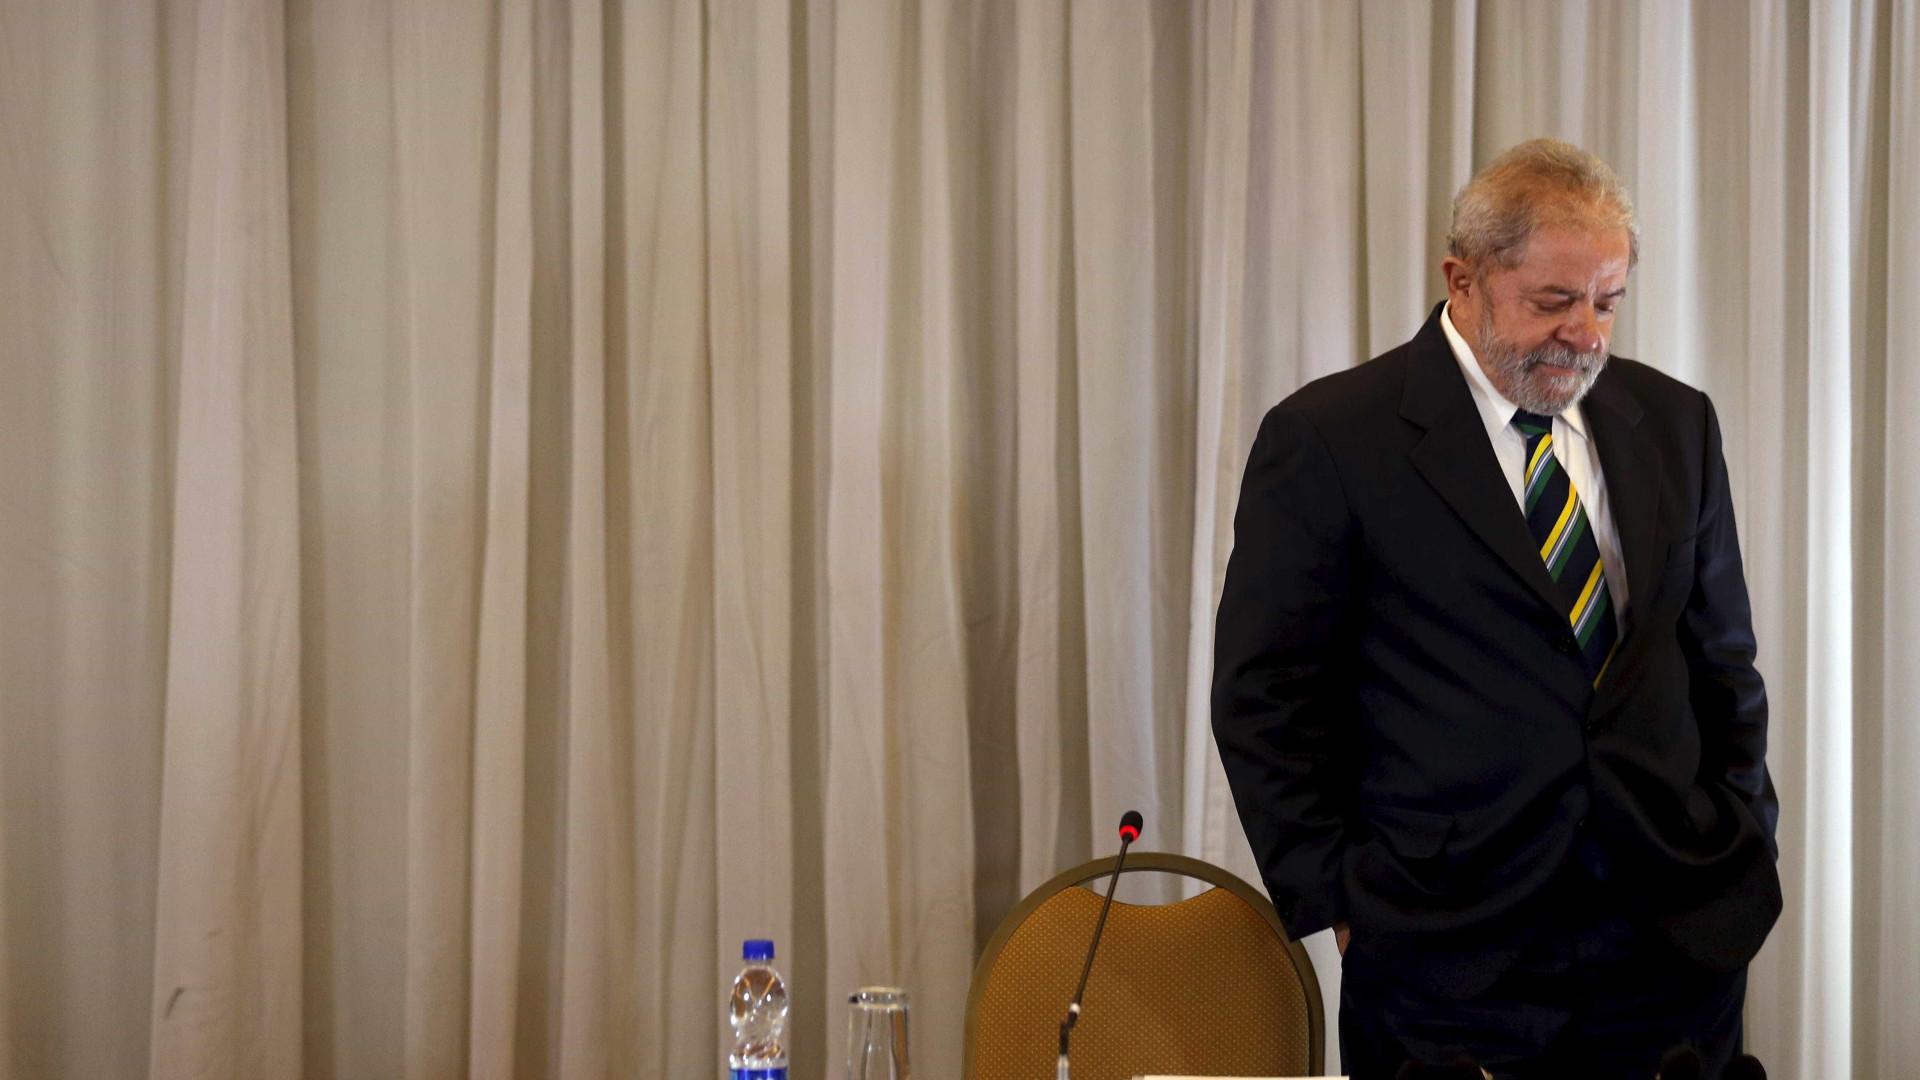 Hospital confirma visita de contador do caso dos recibos de Lula